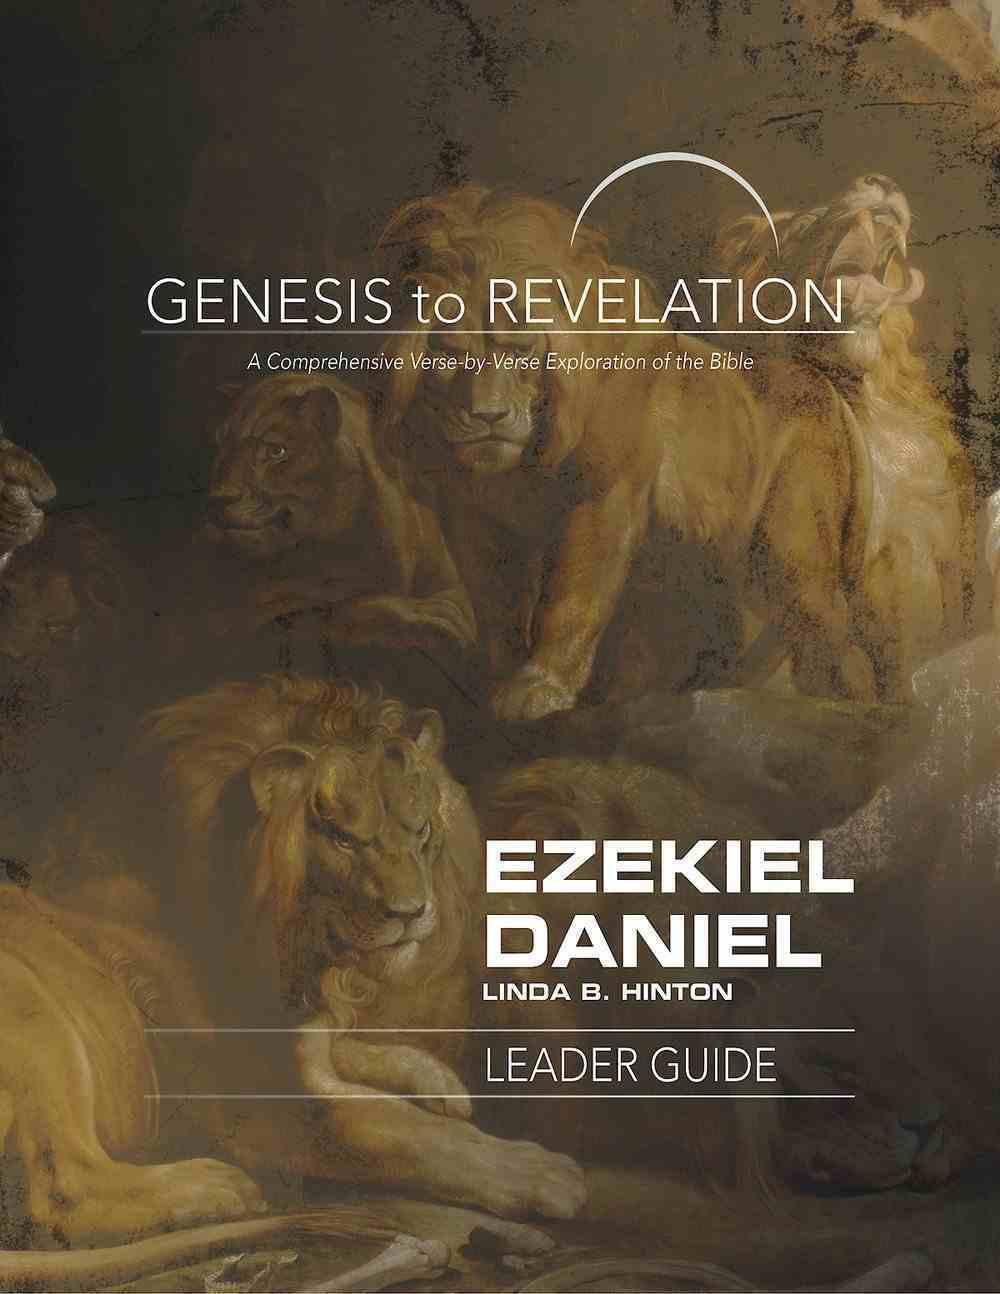 Ezekiel, Daniel Leader Guide (Genesis To Revelation Series) eBook